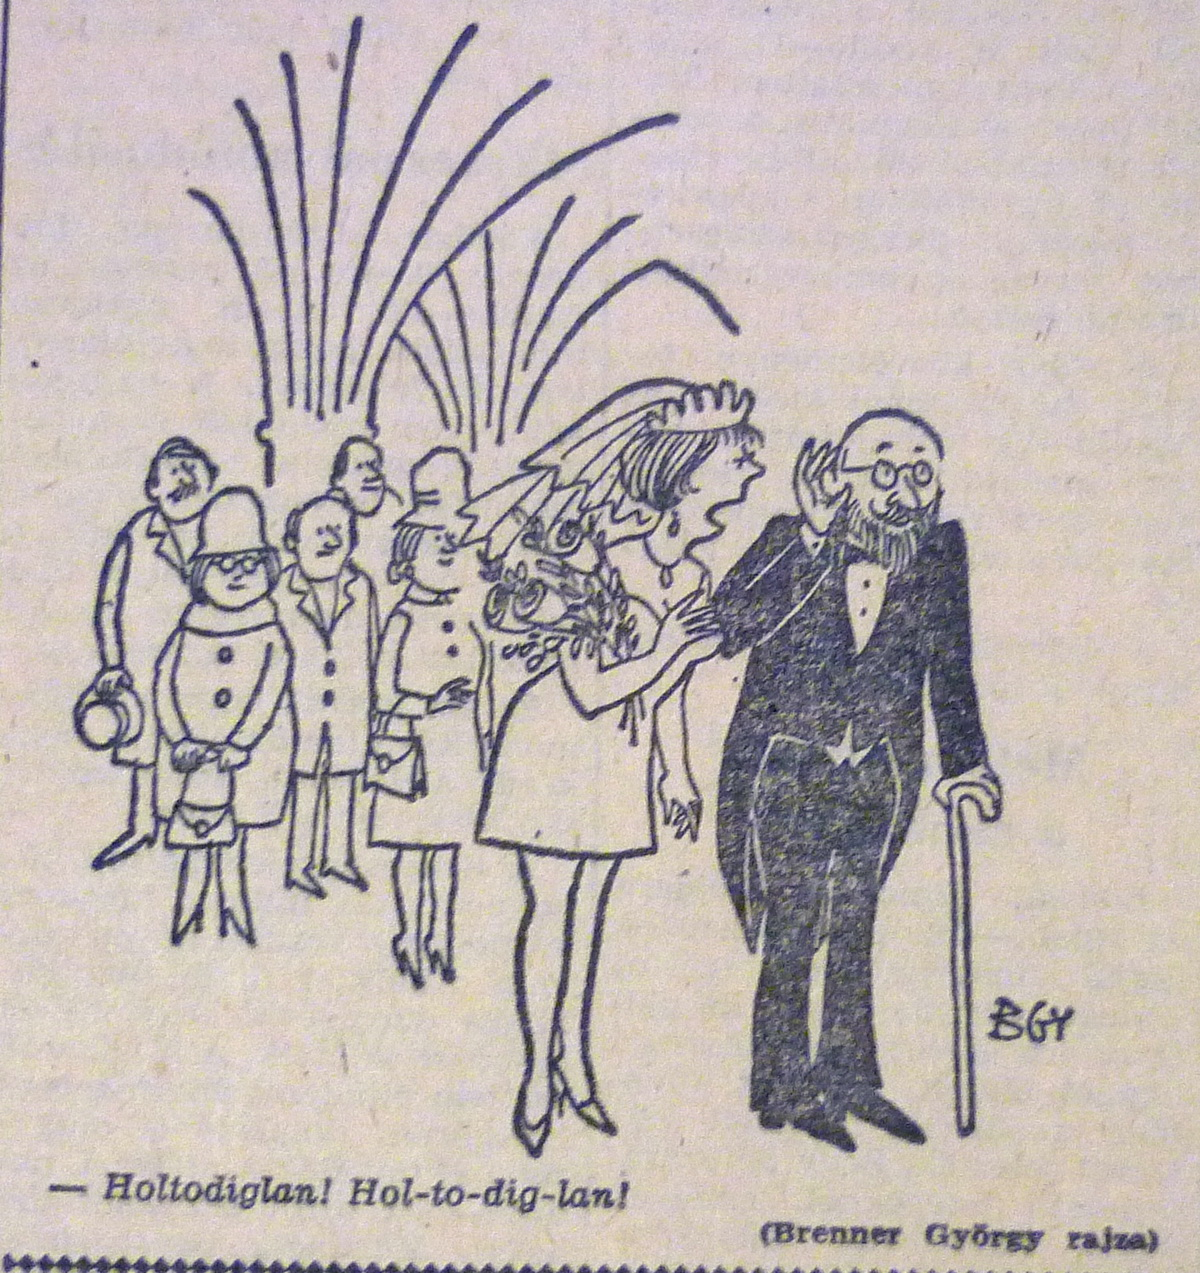 karikatura-197004-magyarnemzet.jpg